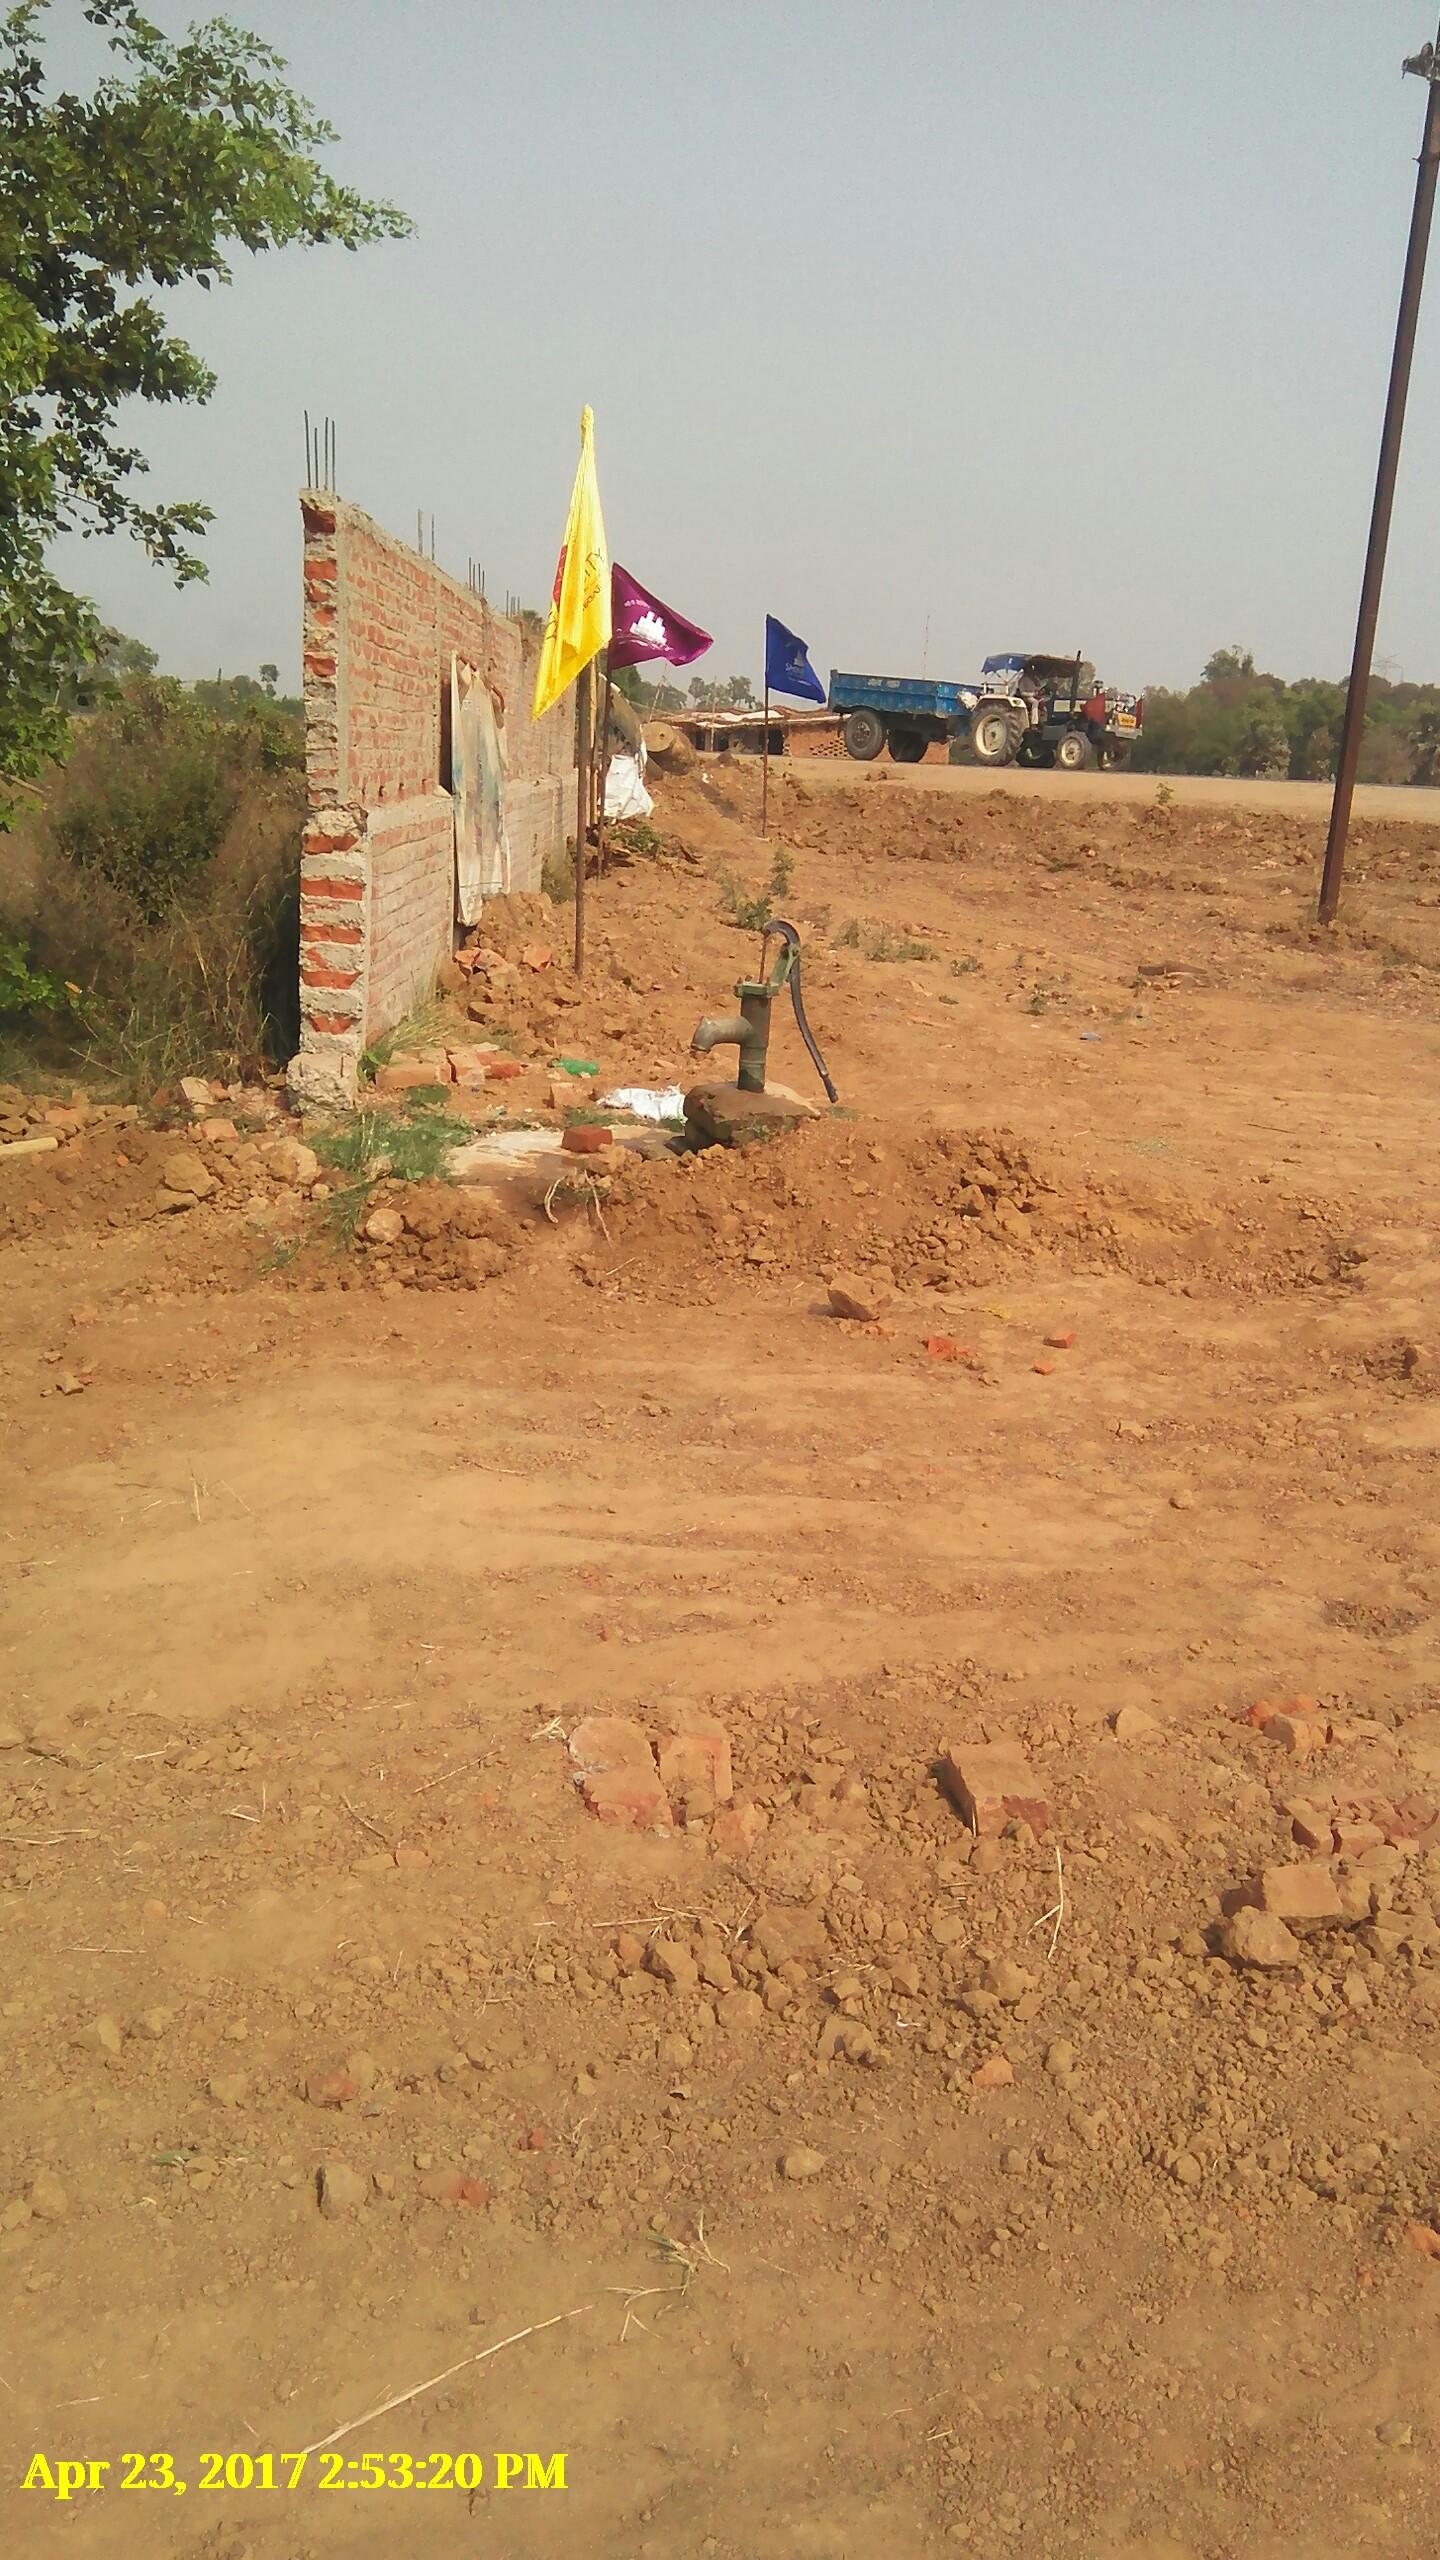 Patna Me Residential Plot Le Asan Masik Kisto Me 5 Year Emi Plan Booking Amount 25 Percent